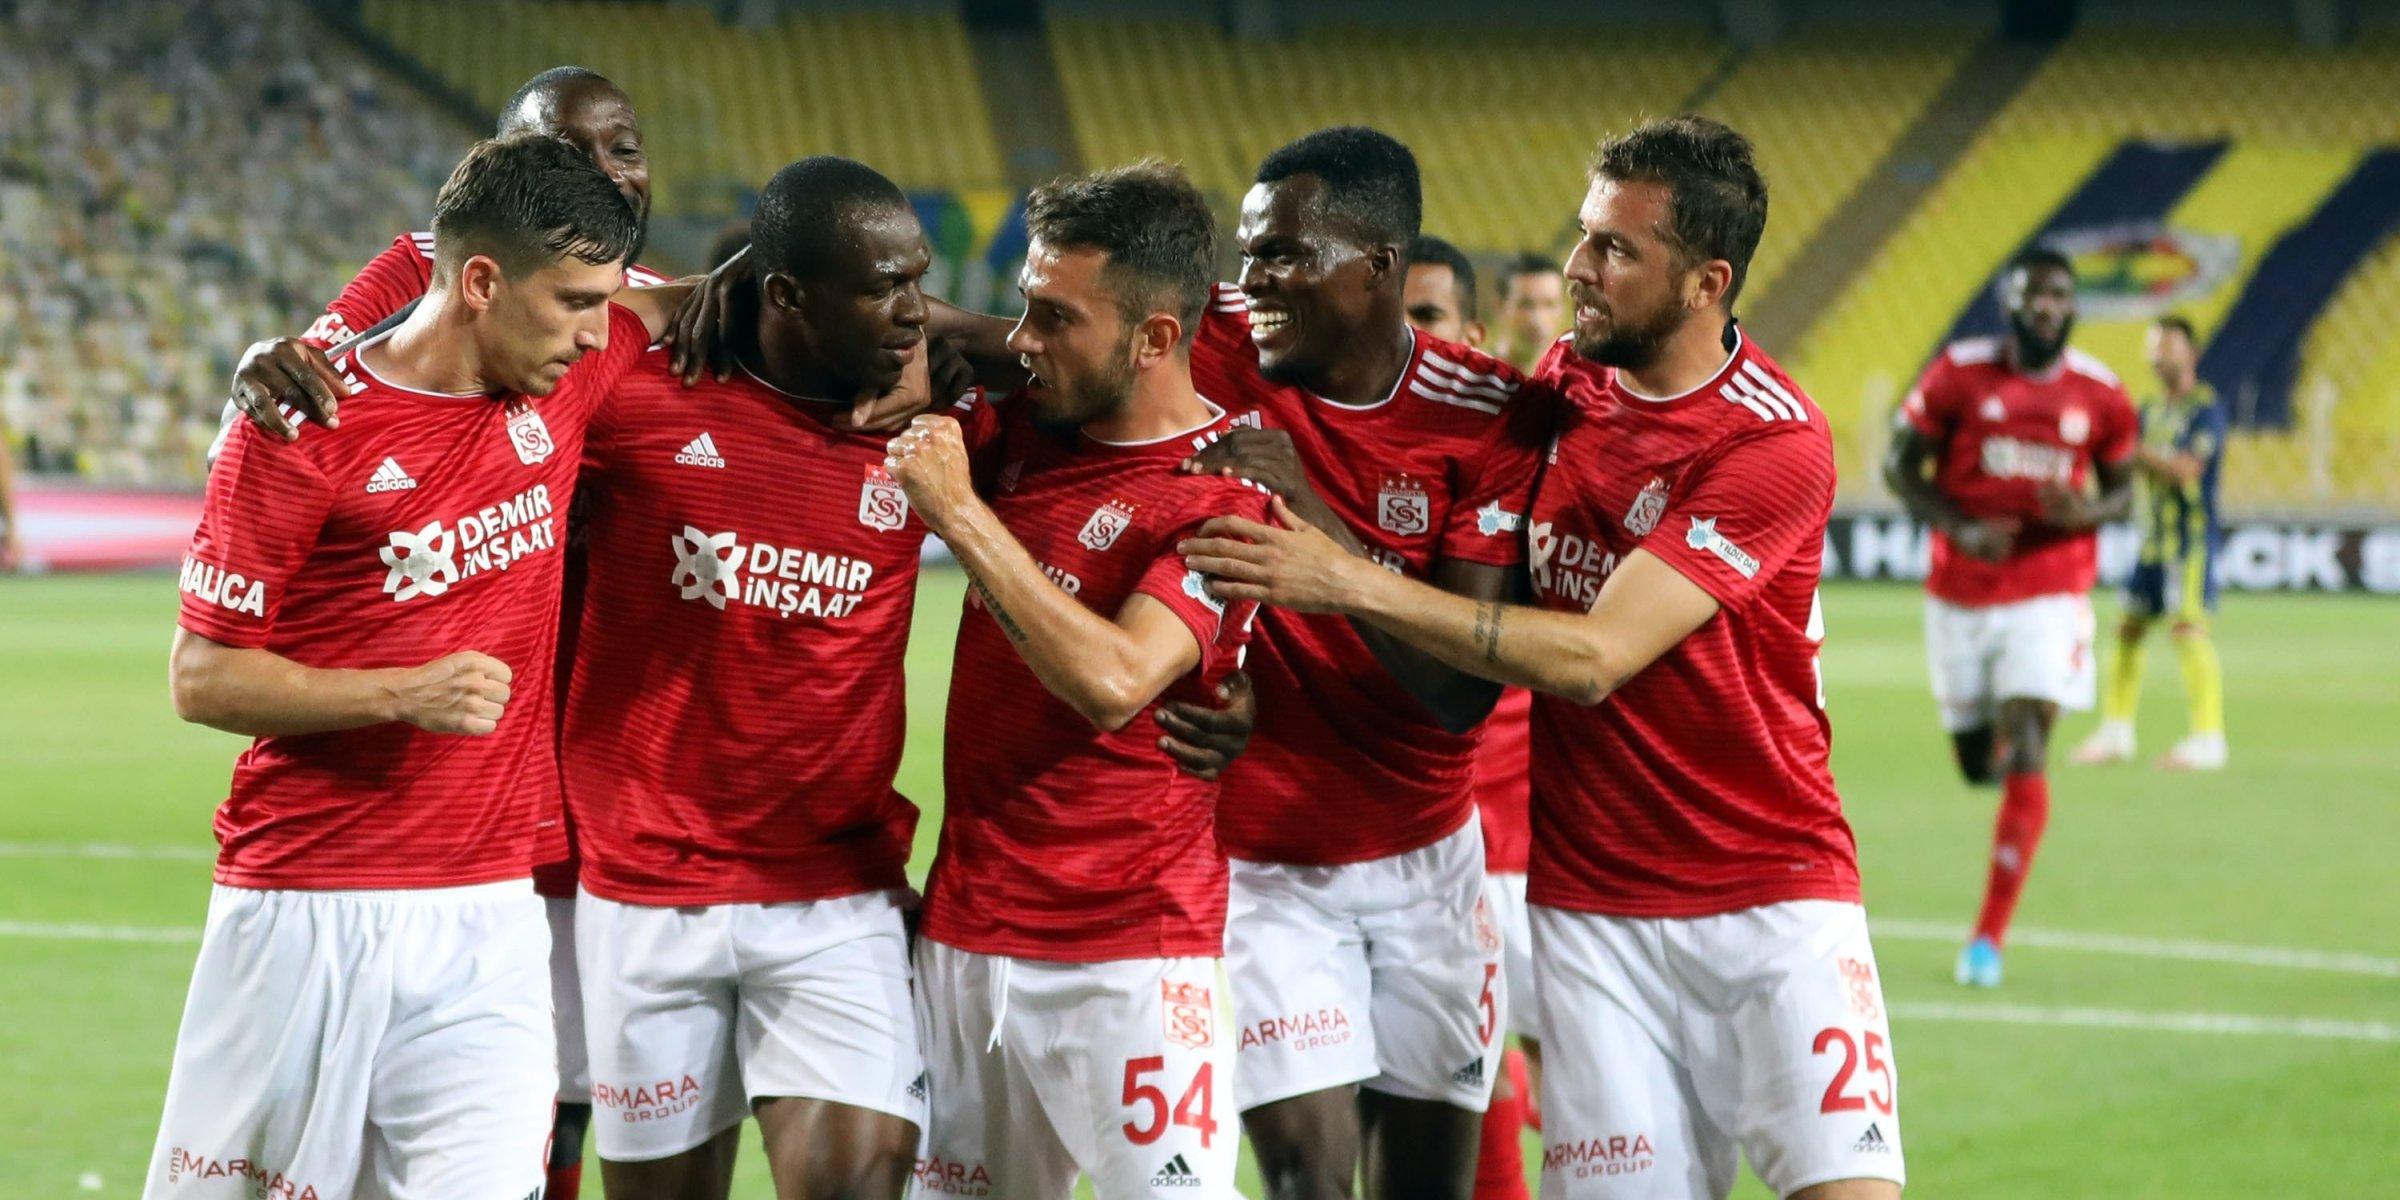 sivasspor to meet villareal qarabag in europa league groups daily sabah sivasspor to meet villareal qarabag in